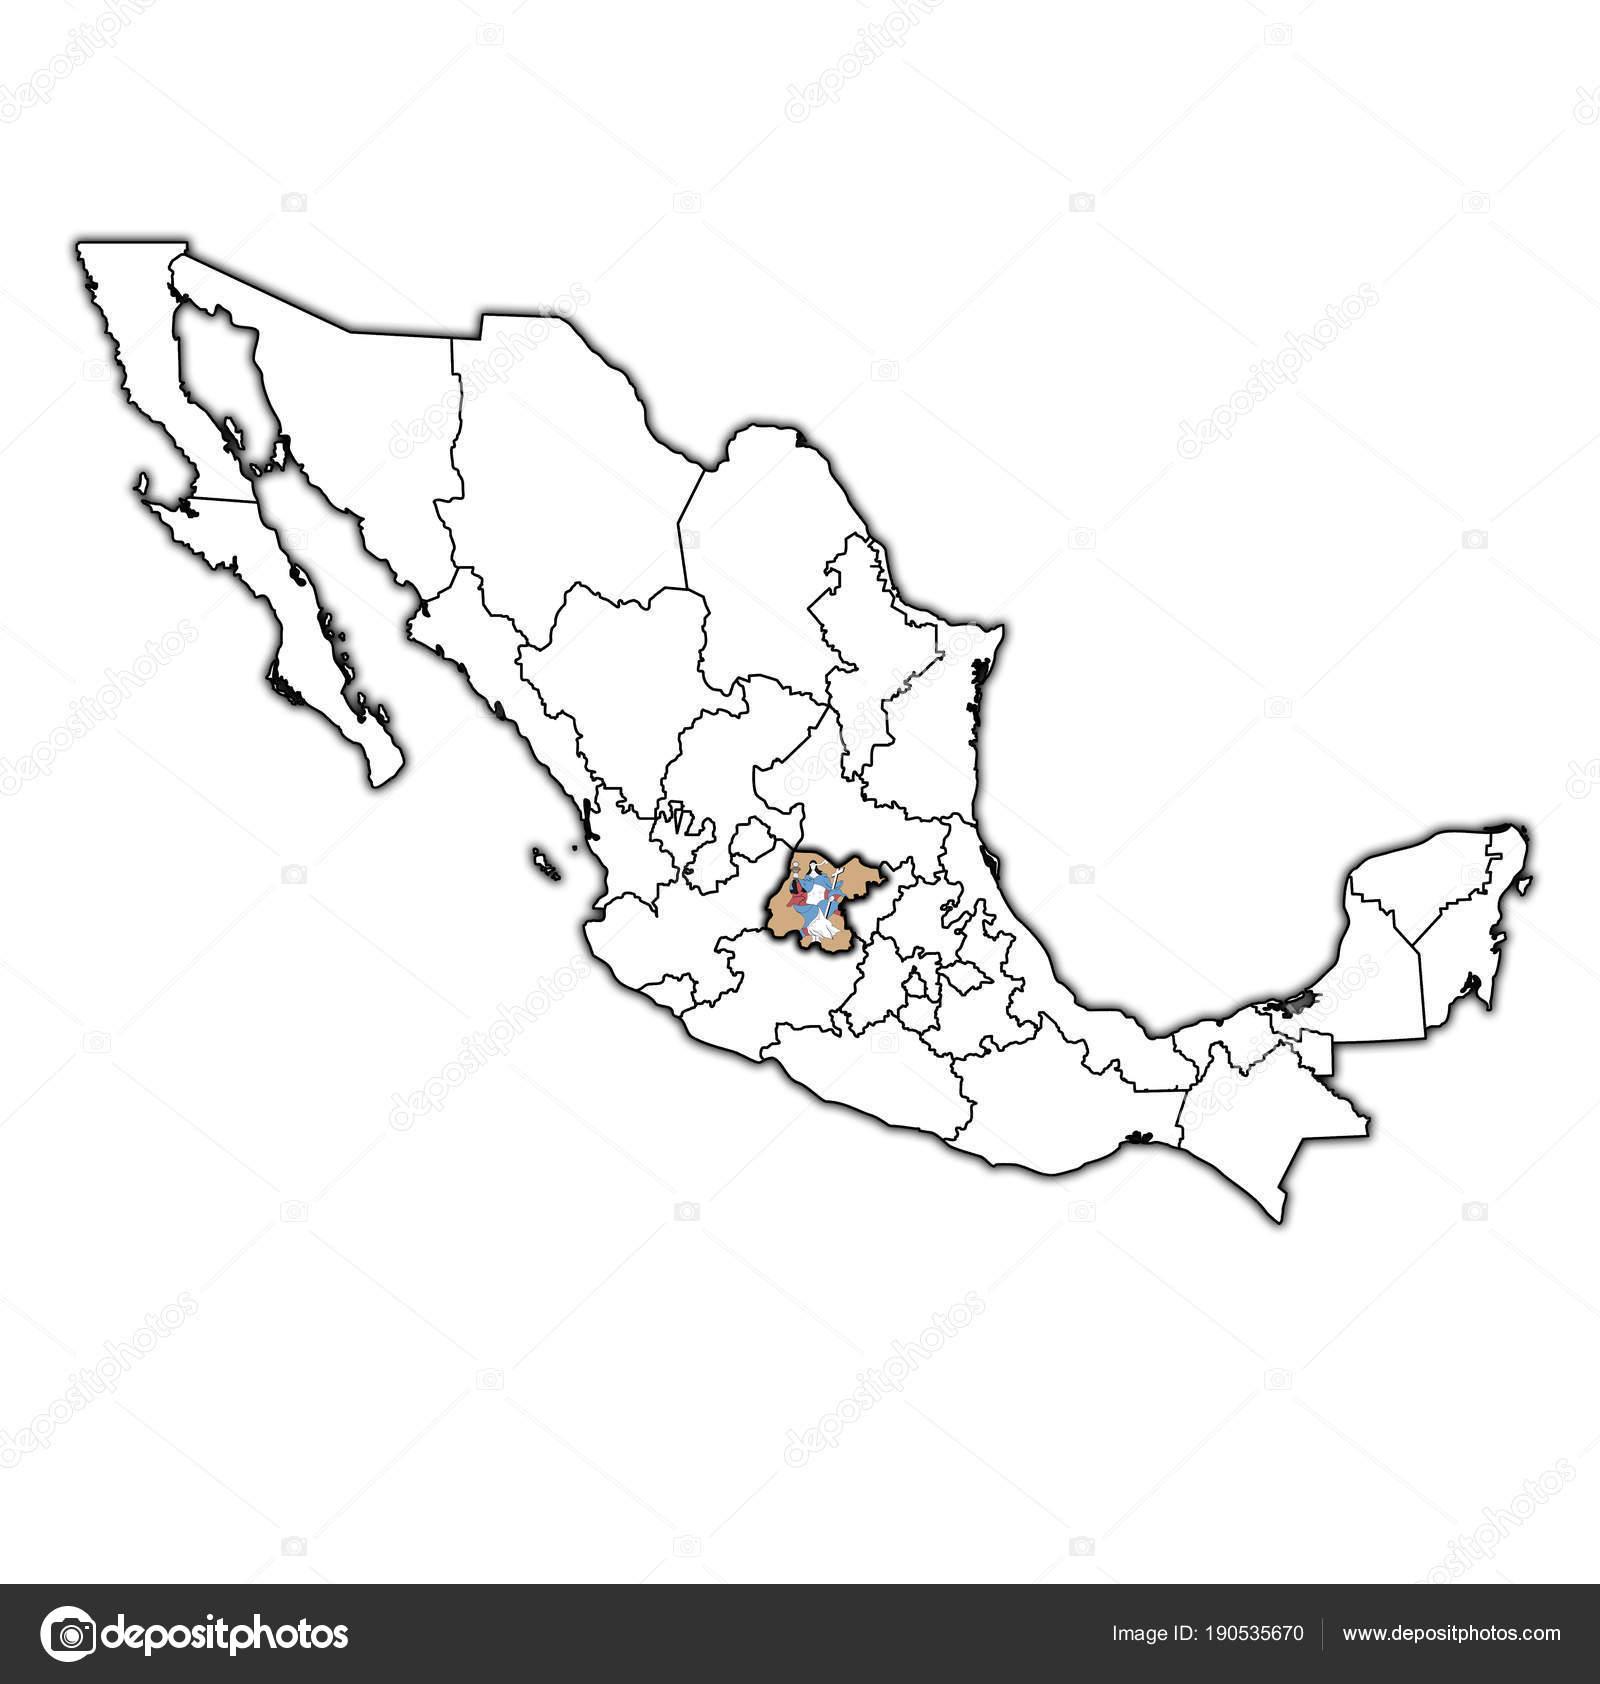 Mexico Map Guanajuato.Guanajuato On Administration Map Of Mexico Stock Photo C Michal812